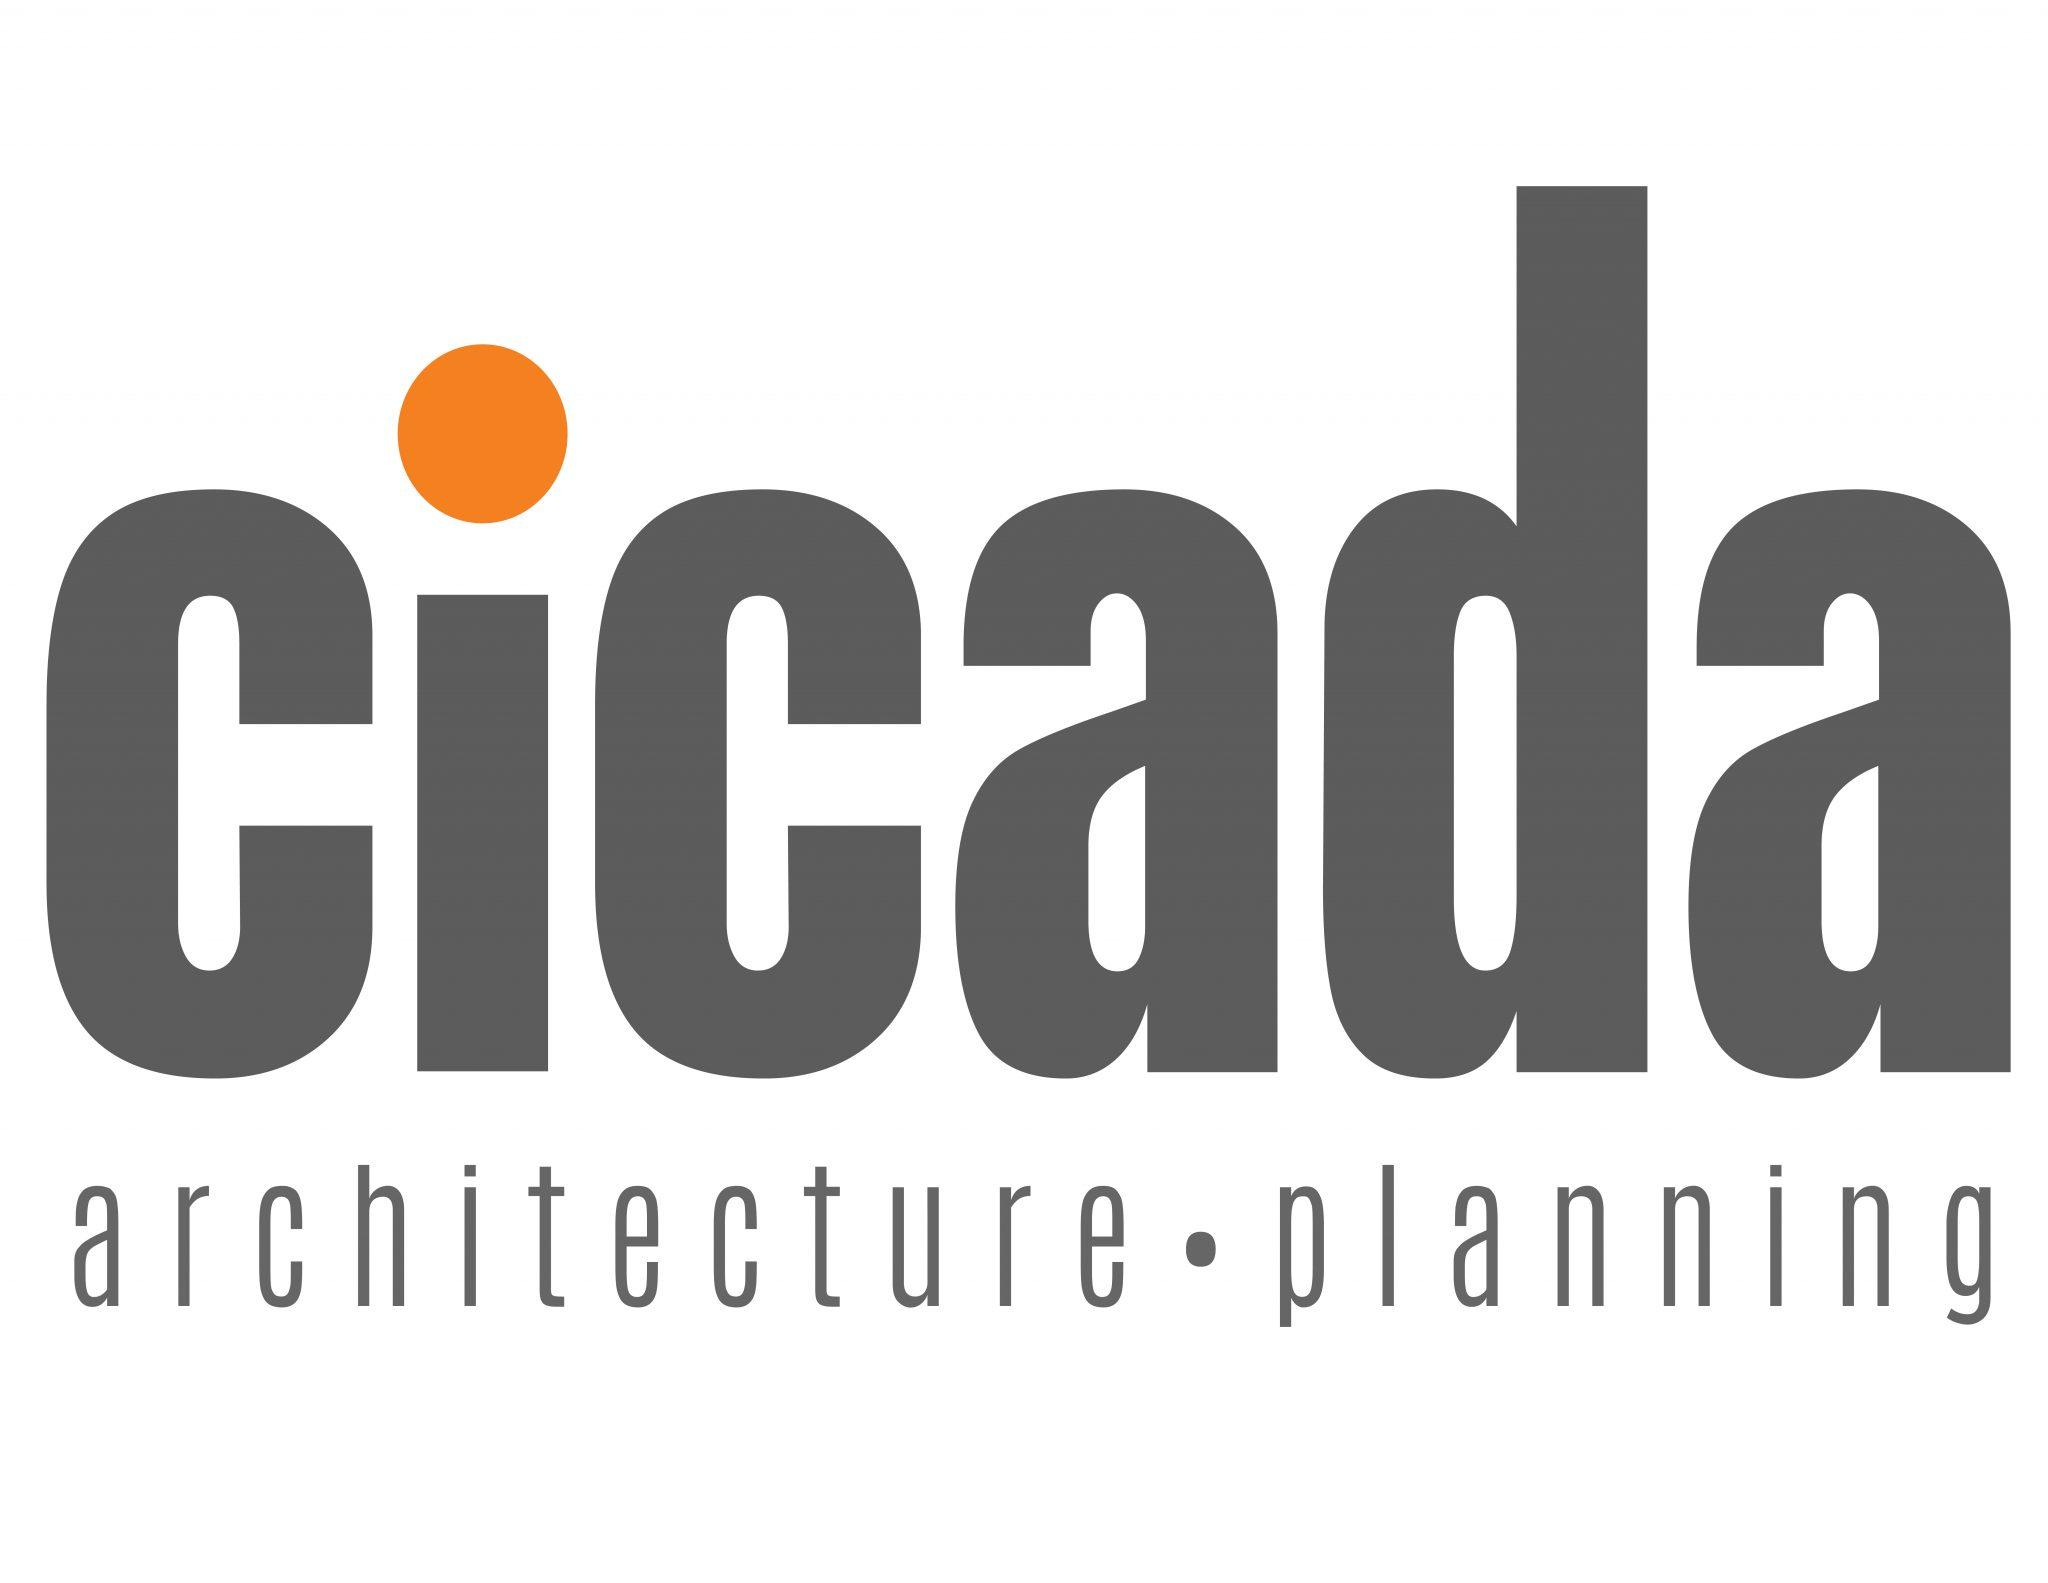 CICADA Architecture | Planning